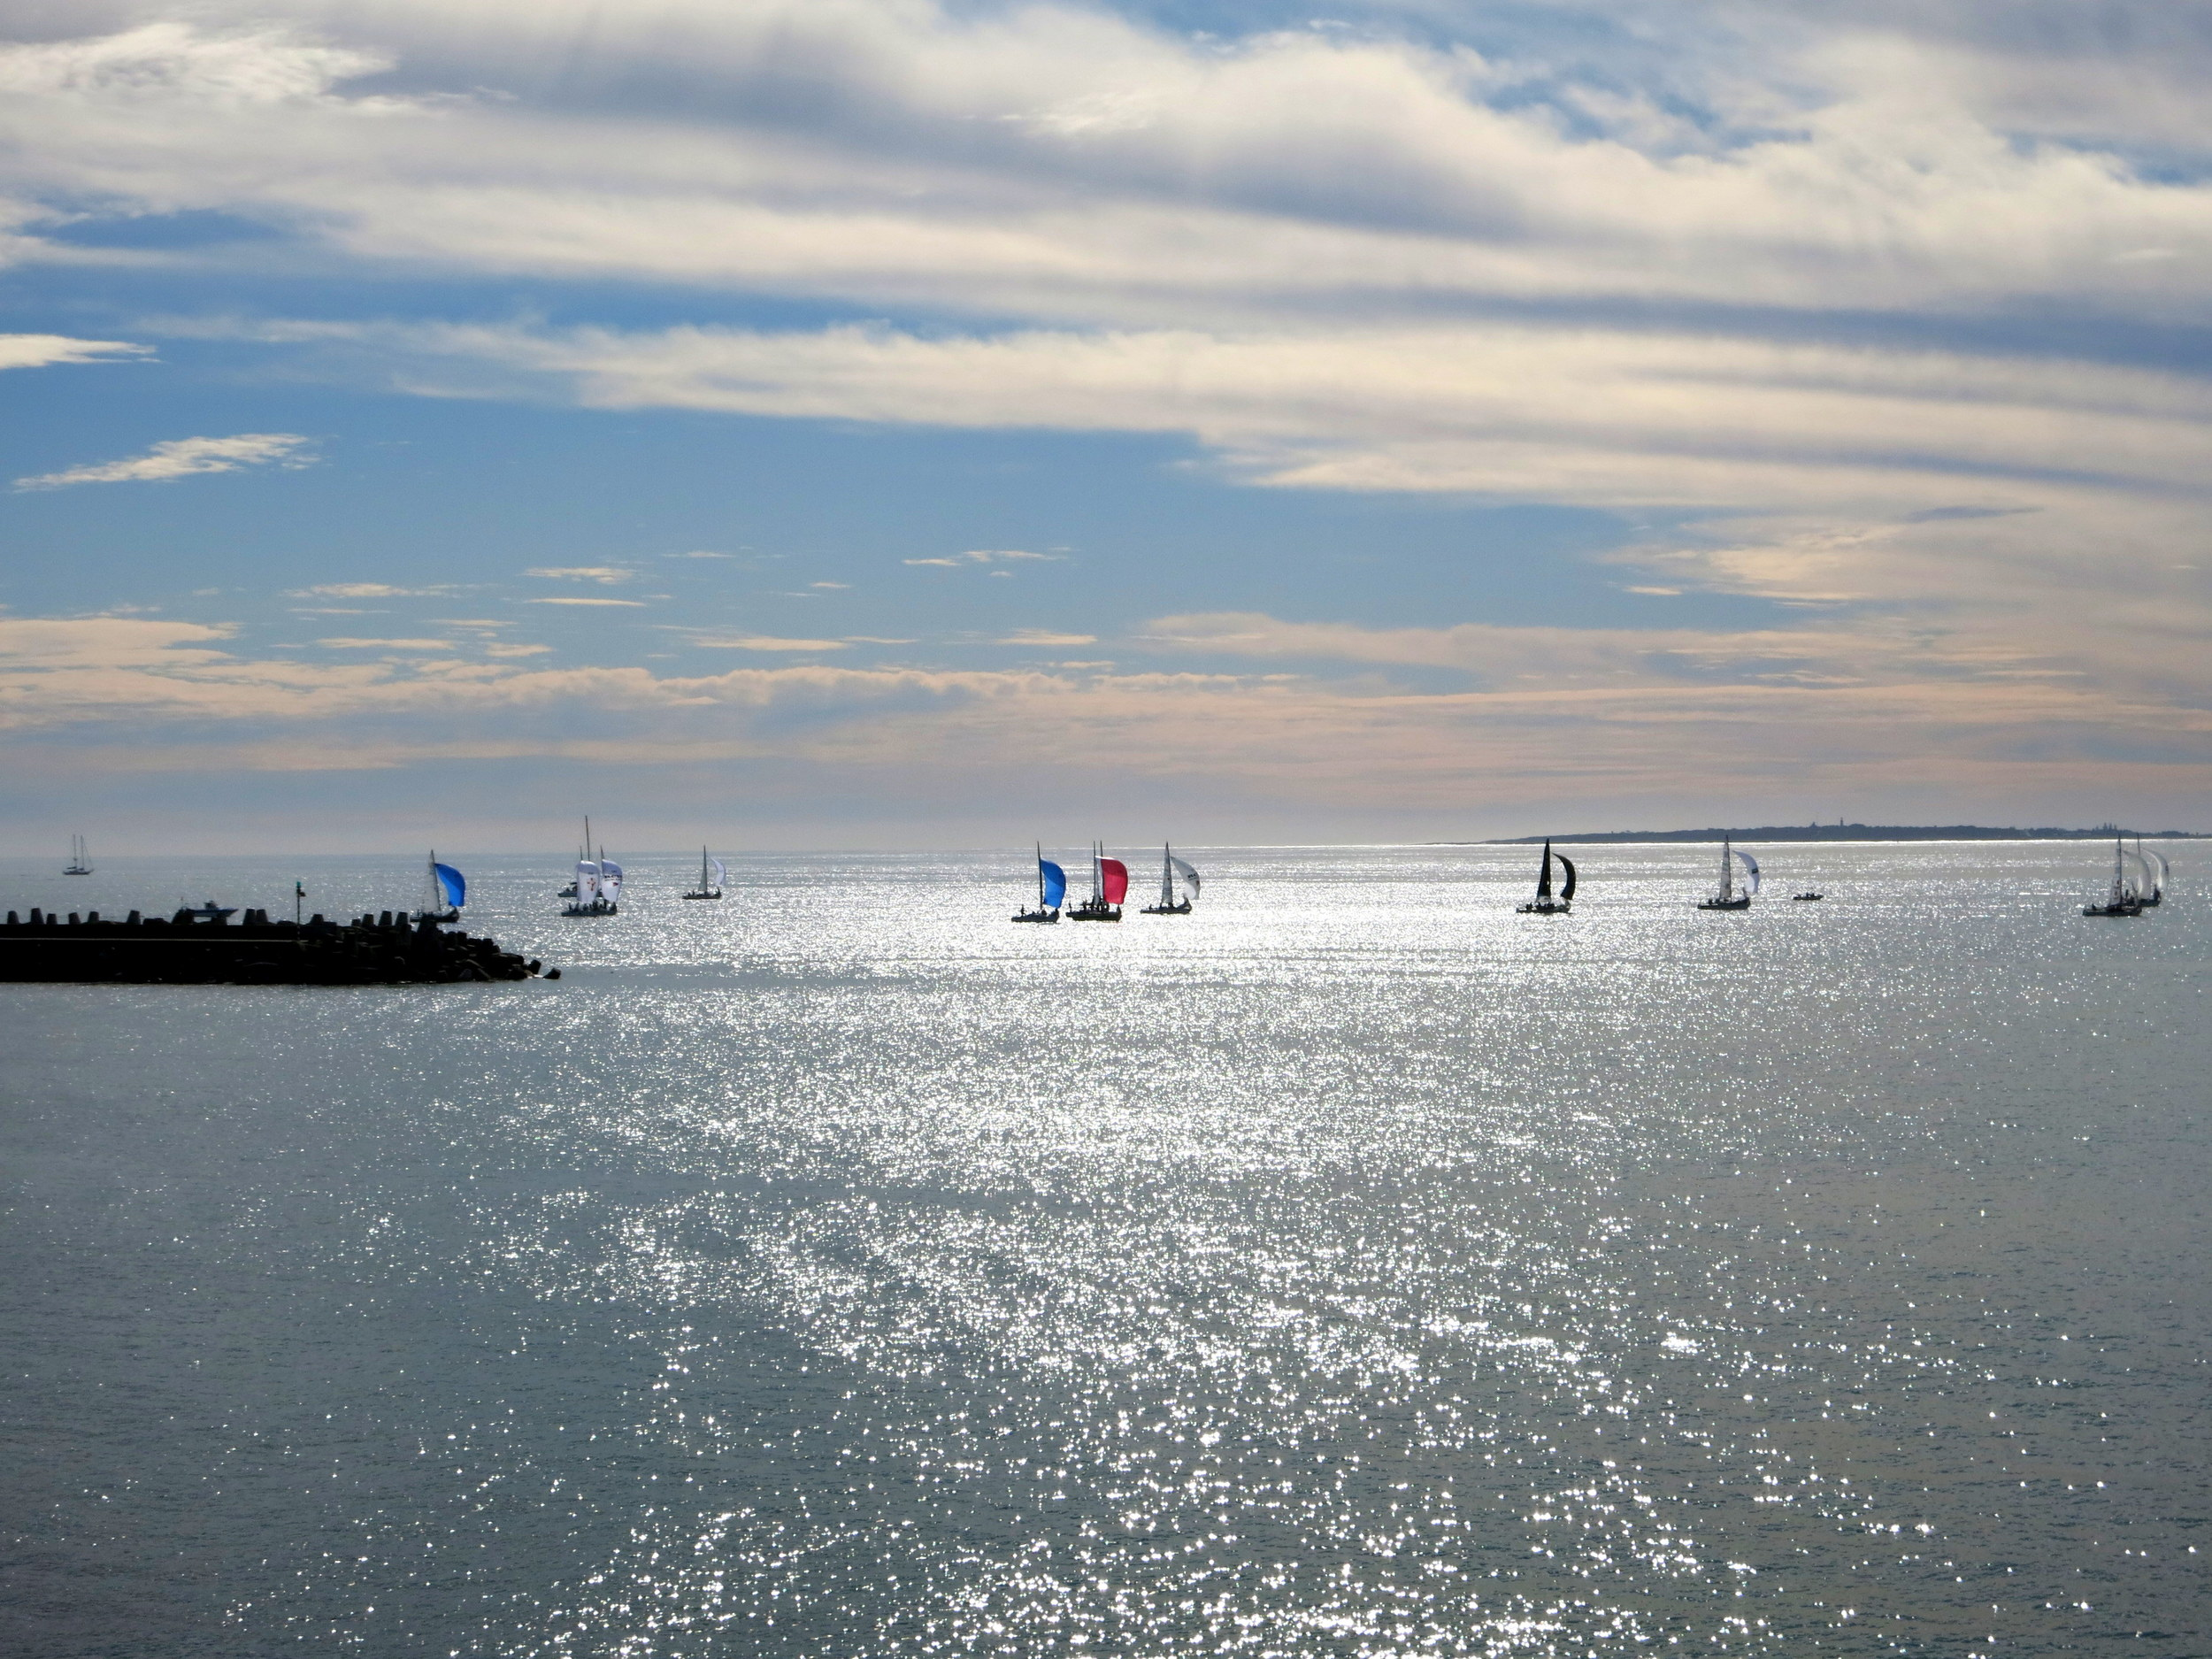 A random regatta.